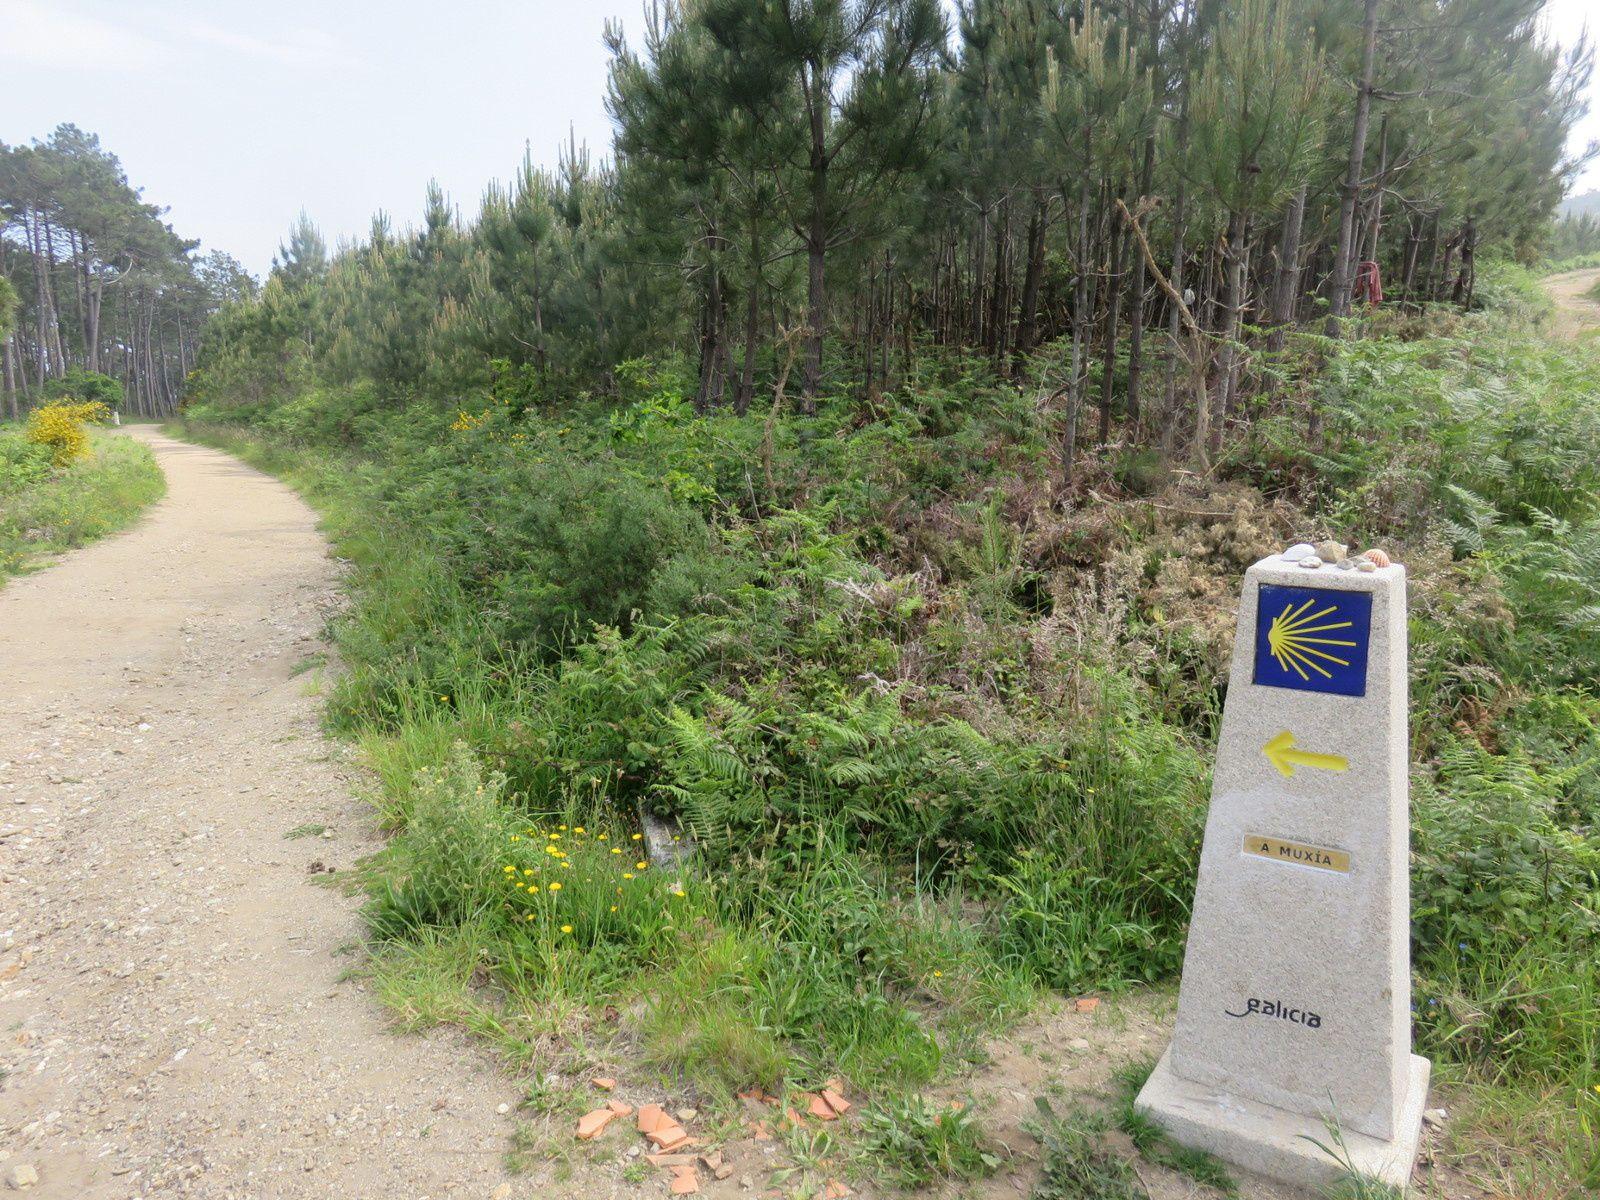 MERCREDI 23 MAI 2018: ETAPE 21: FISTERRA -LIRES : 15 km